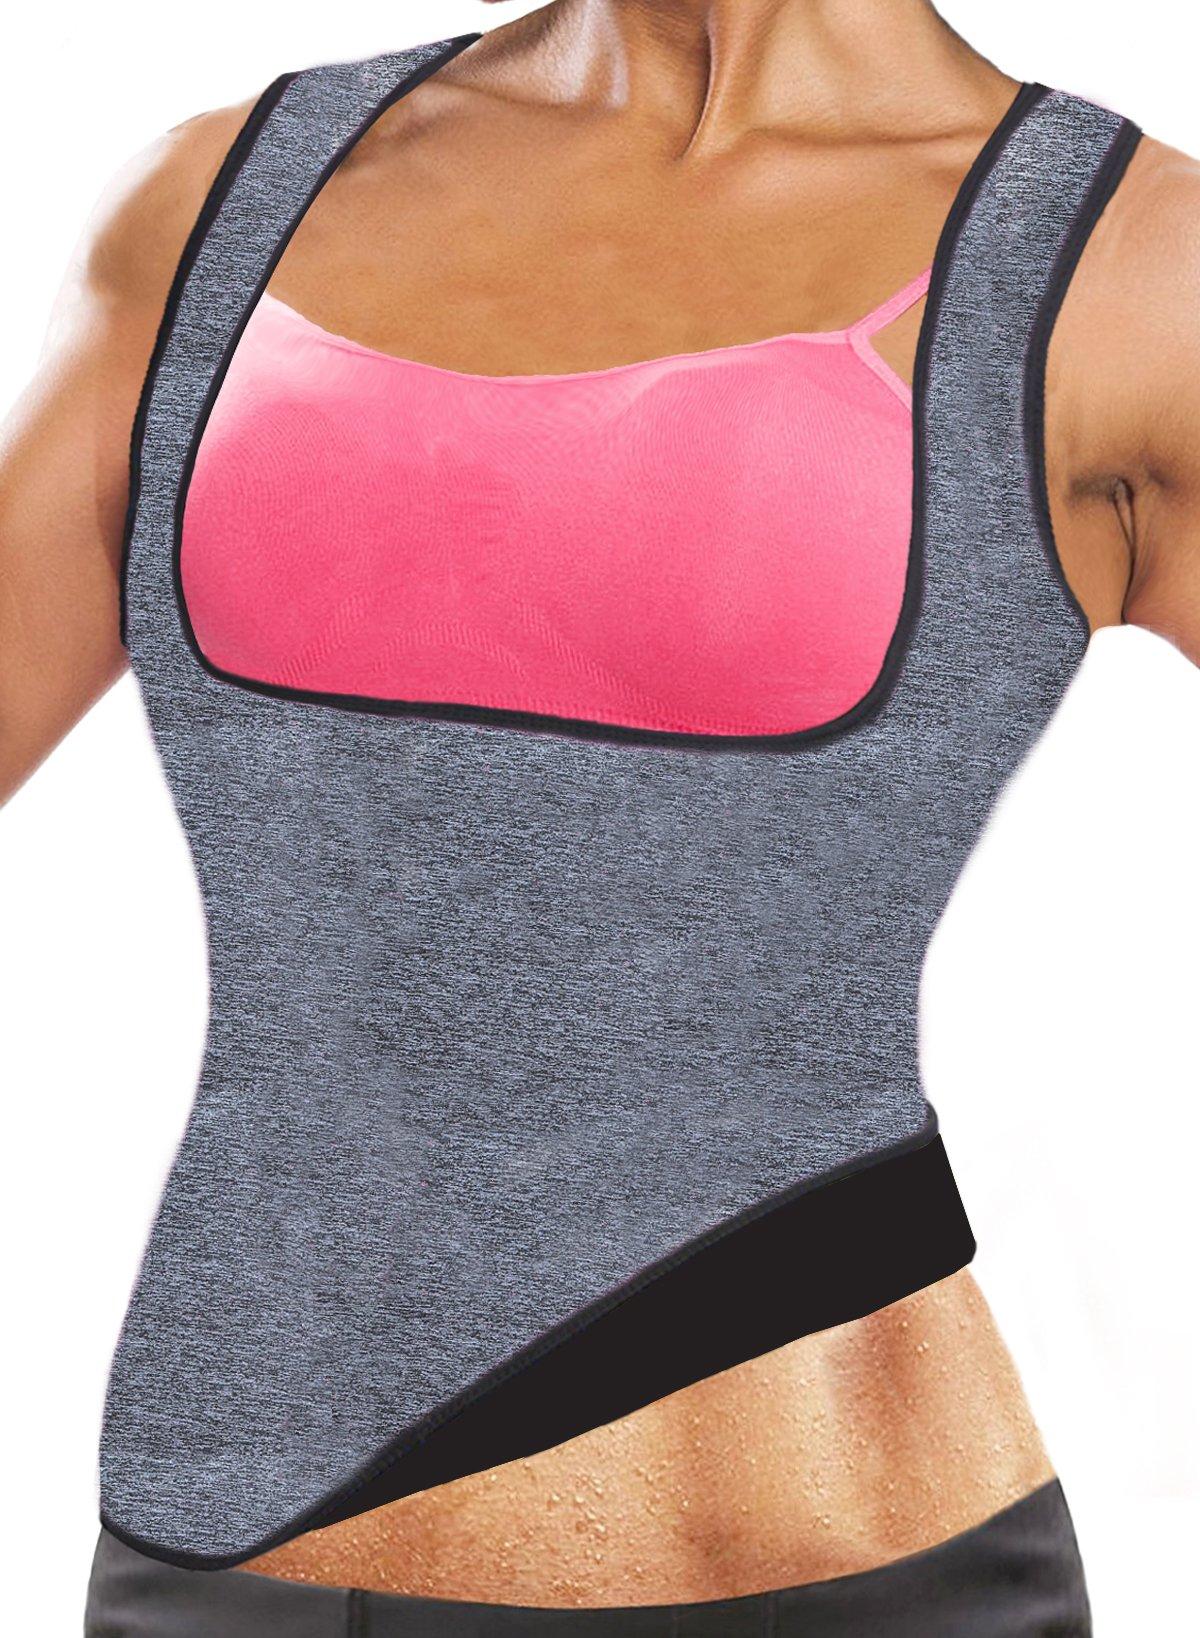 ab998cc389 Hot Shapers Neoprene Sauna Sweat Vest Waist Trainer Waist Trainer